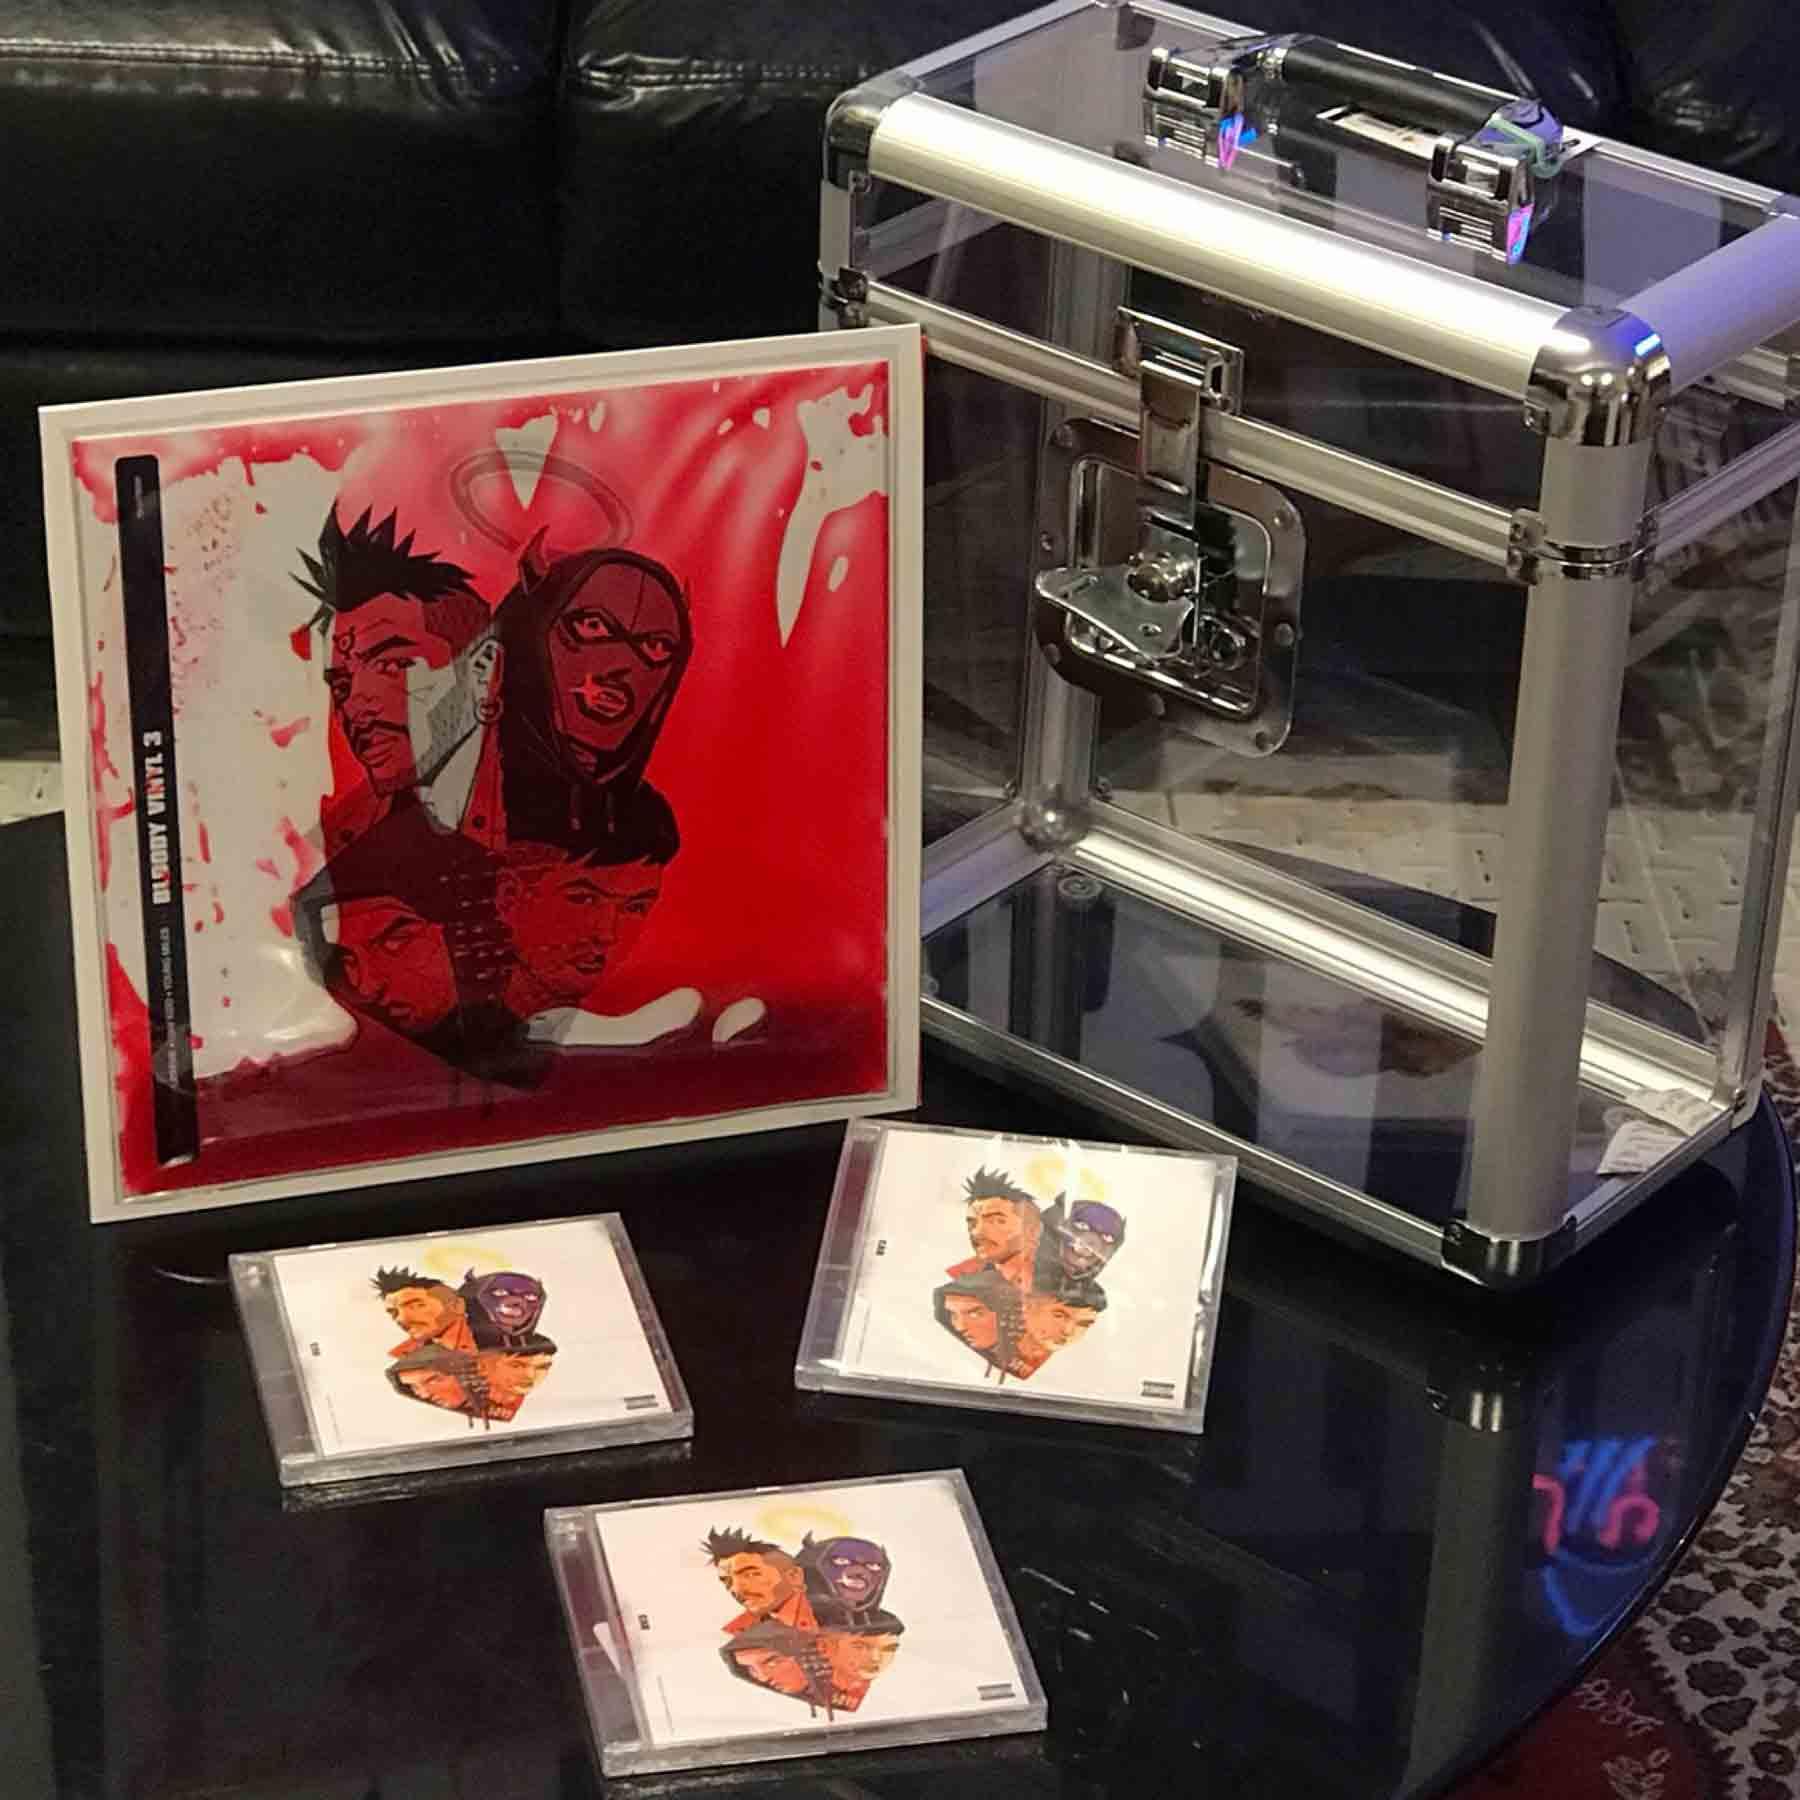 Semm Music Store Bloody Vinyl